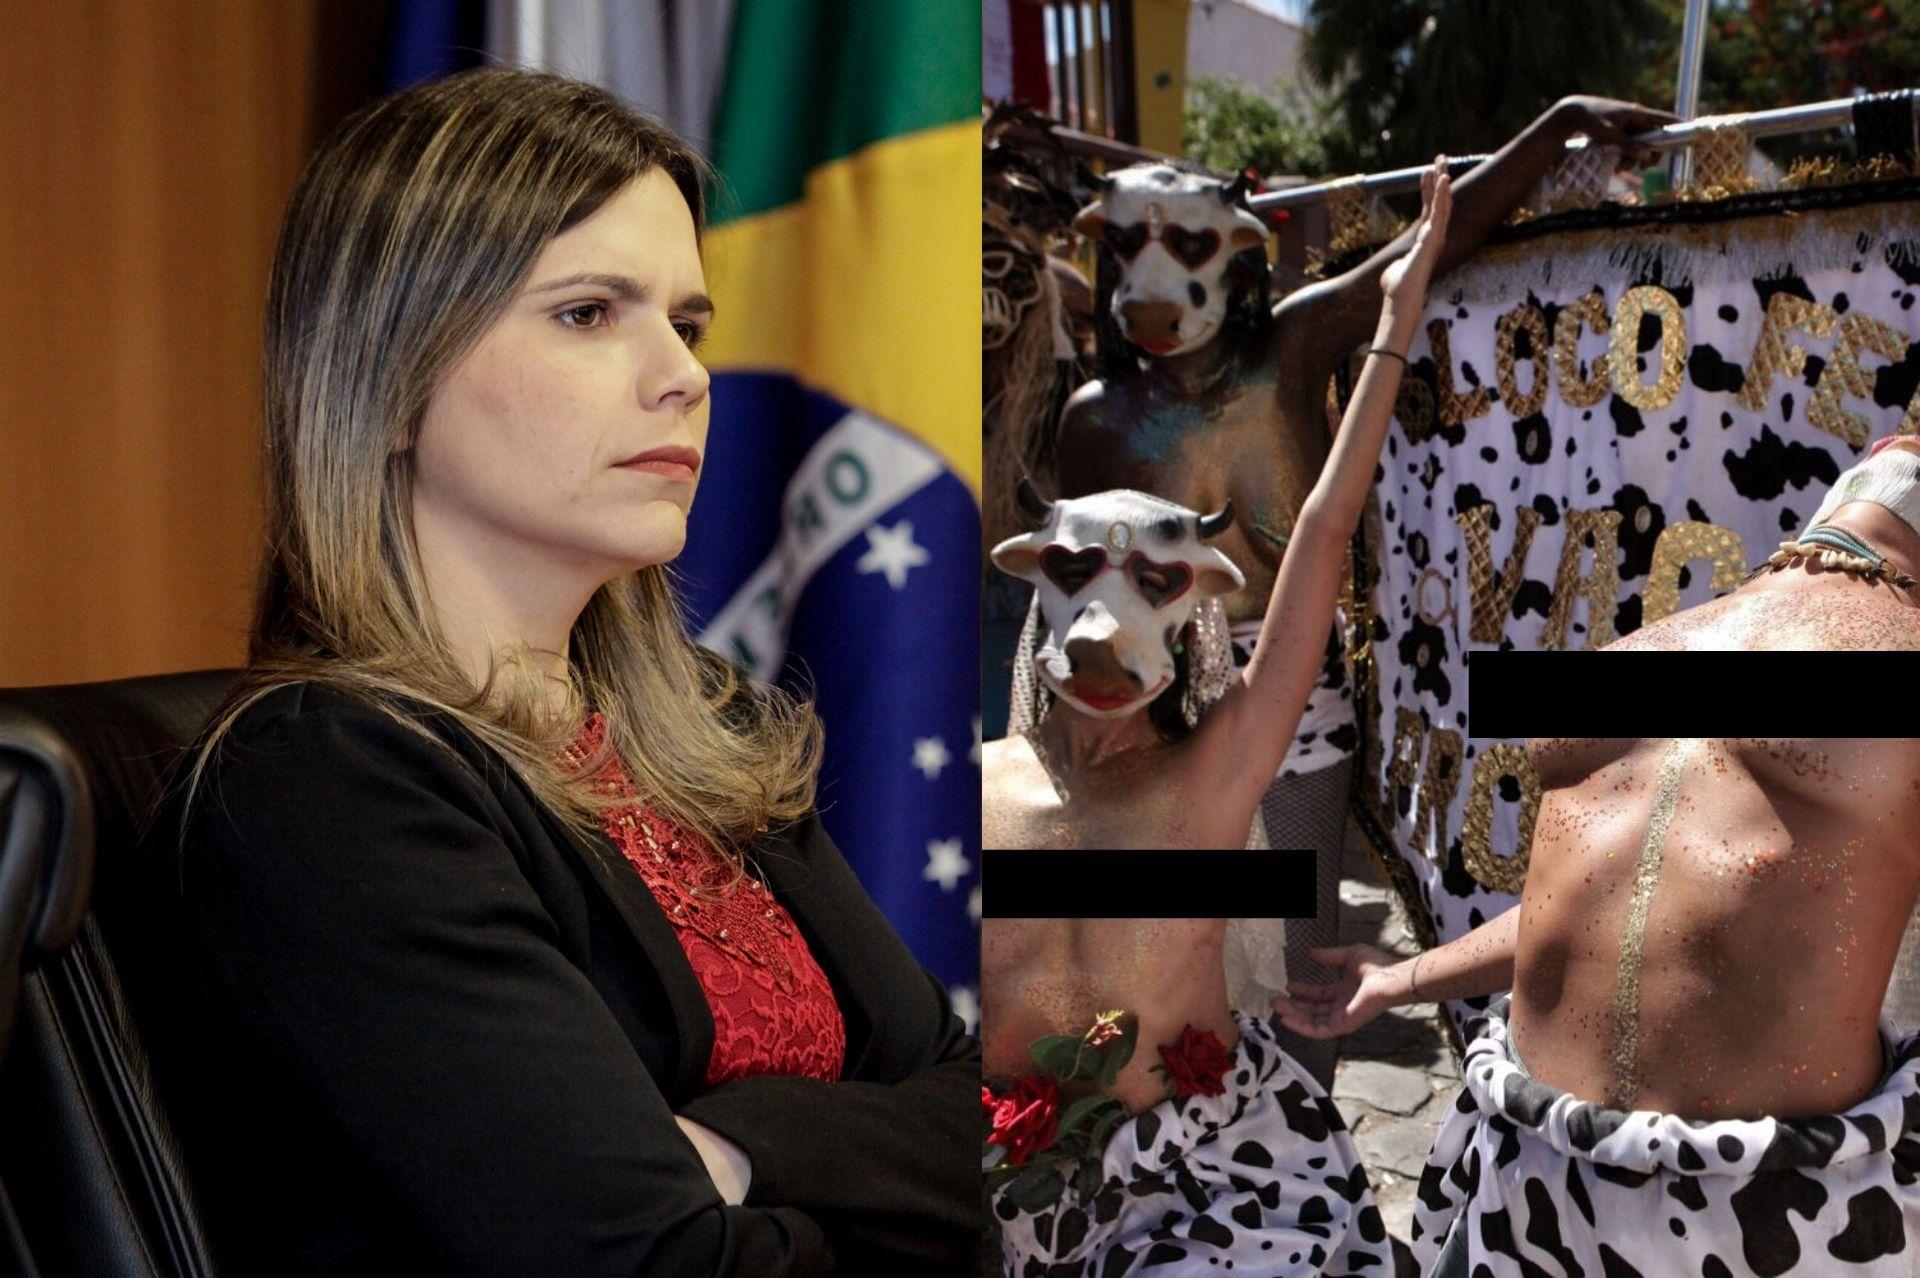 Clarissa Tércio solicita policiamento para coibir atos obscenos em bloco carnavalesco de Olinda